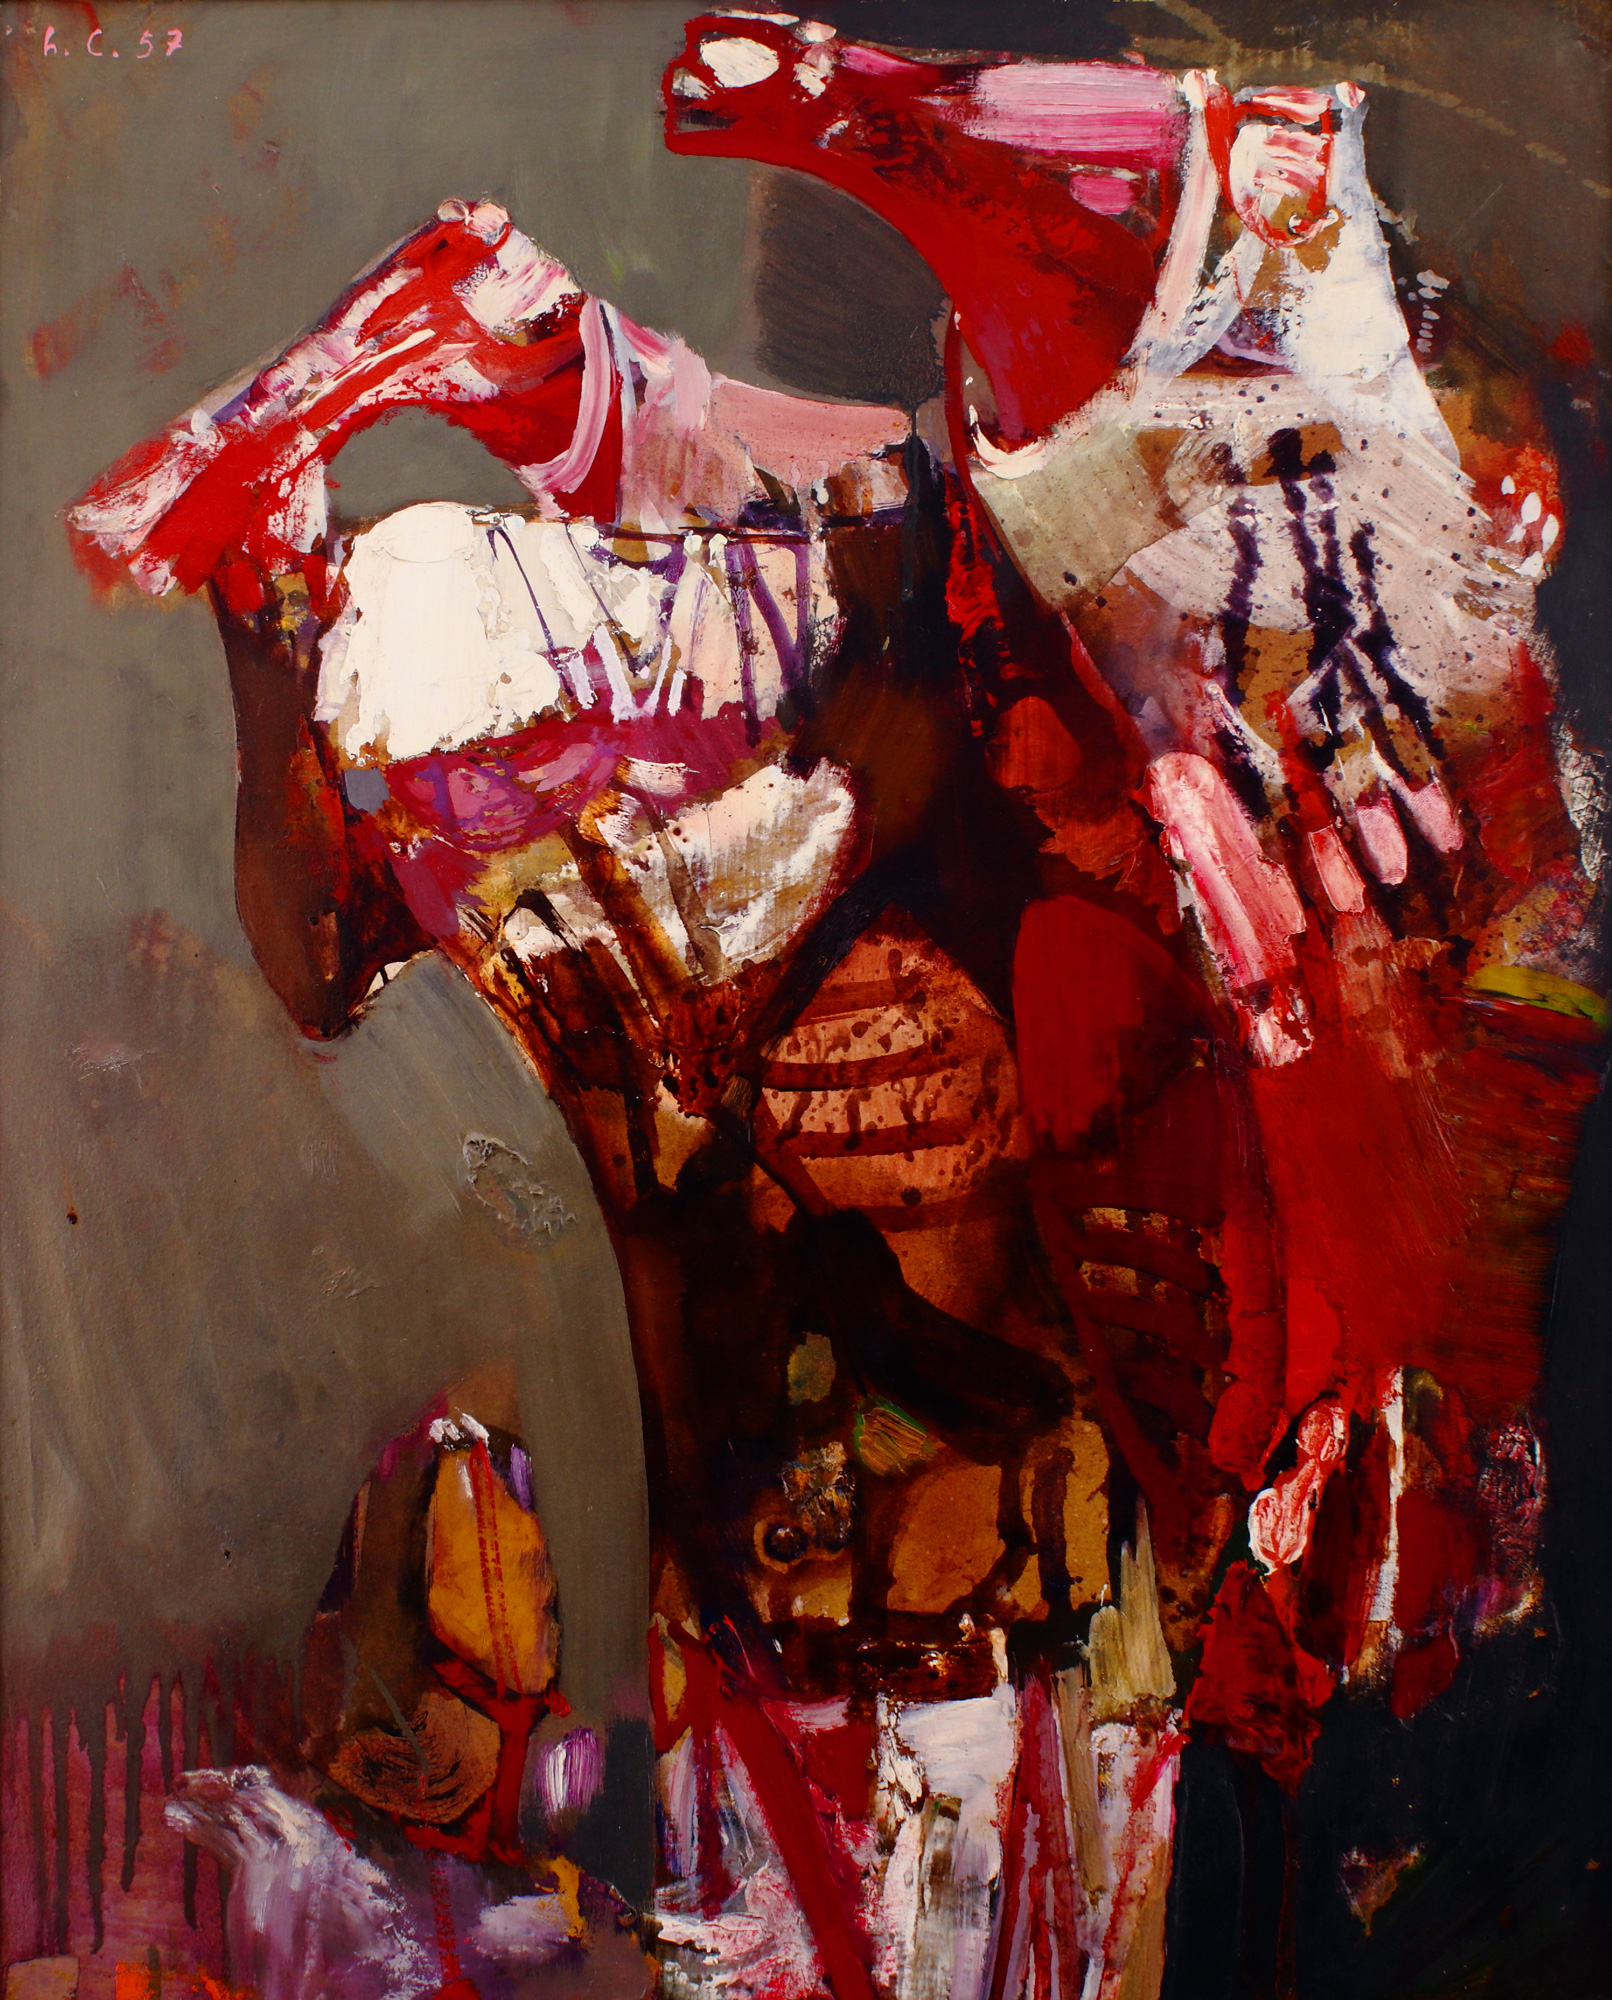 Leonardo Cremonini - L'uomo che porta la carne 1957